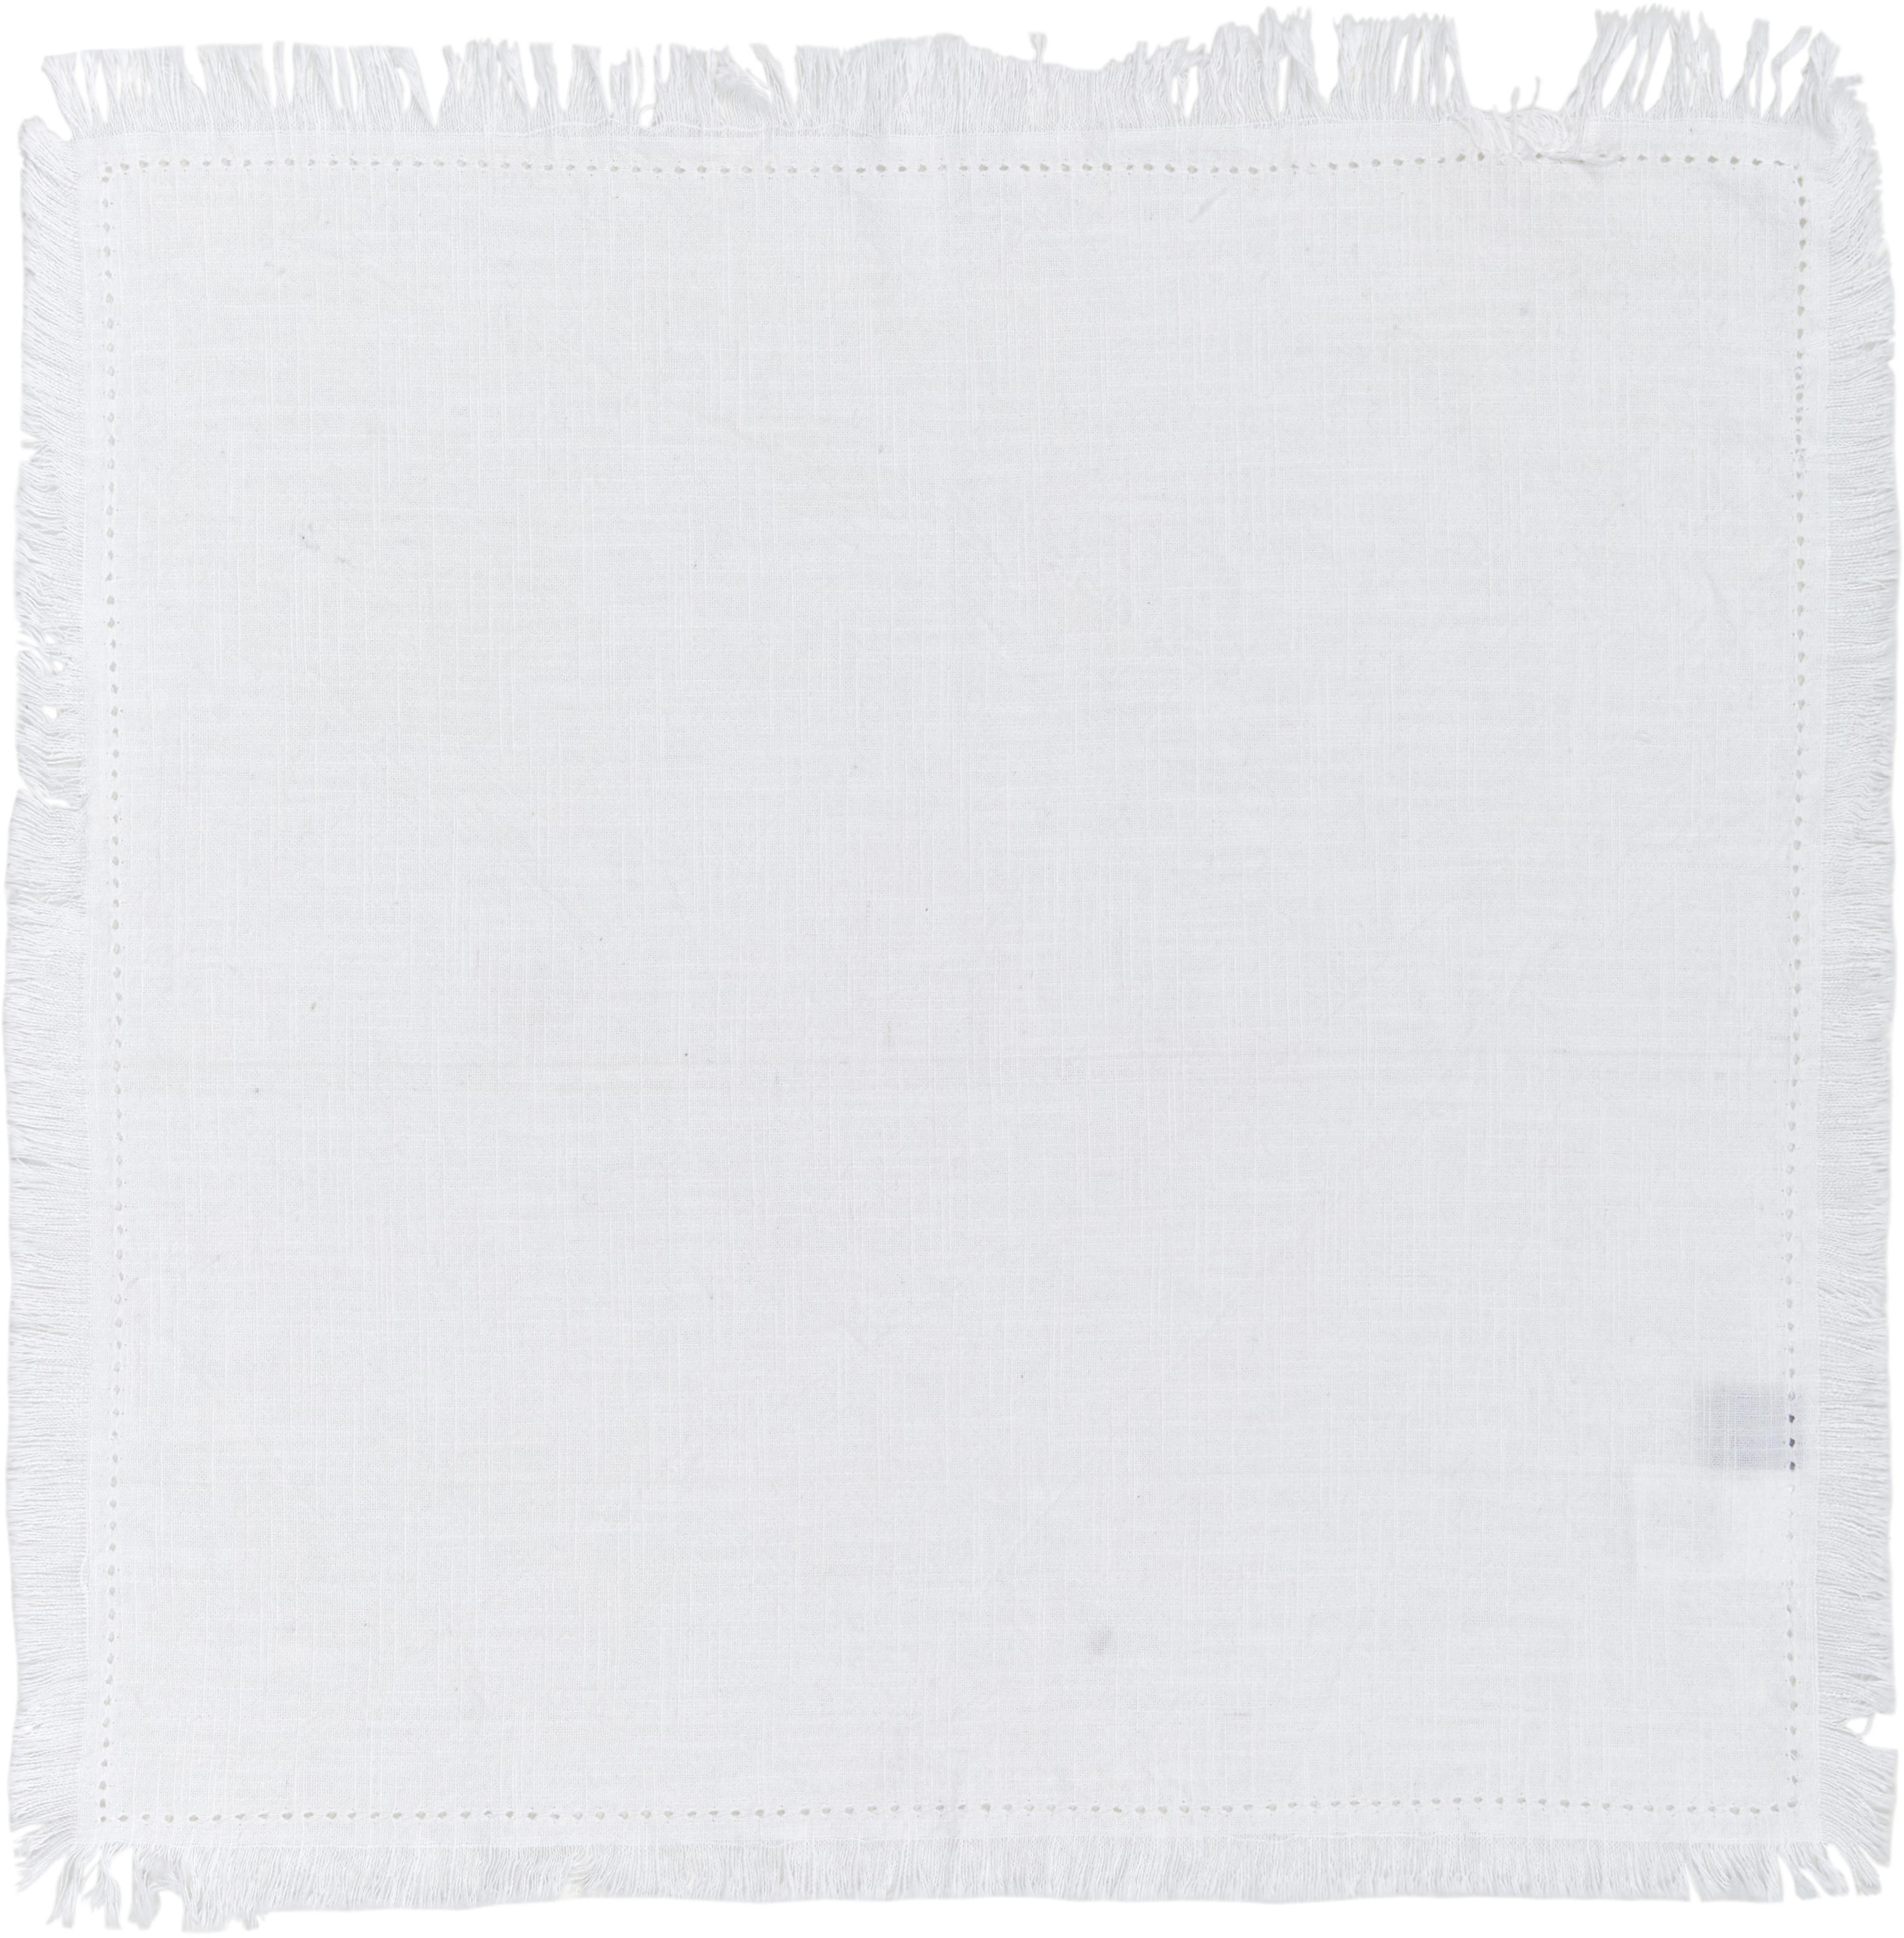 Katoenen servetten Hilma met franjes, 2 stuks, Katoen, Wit, 45 x 45 cm